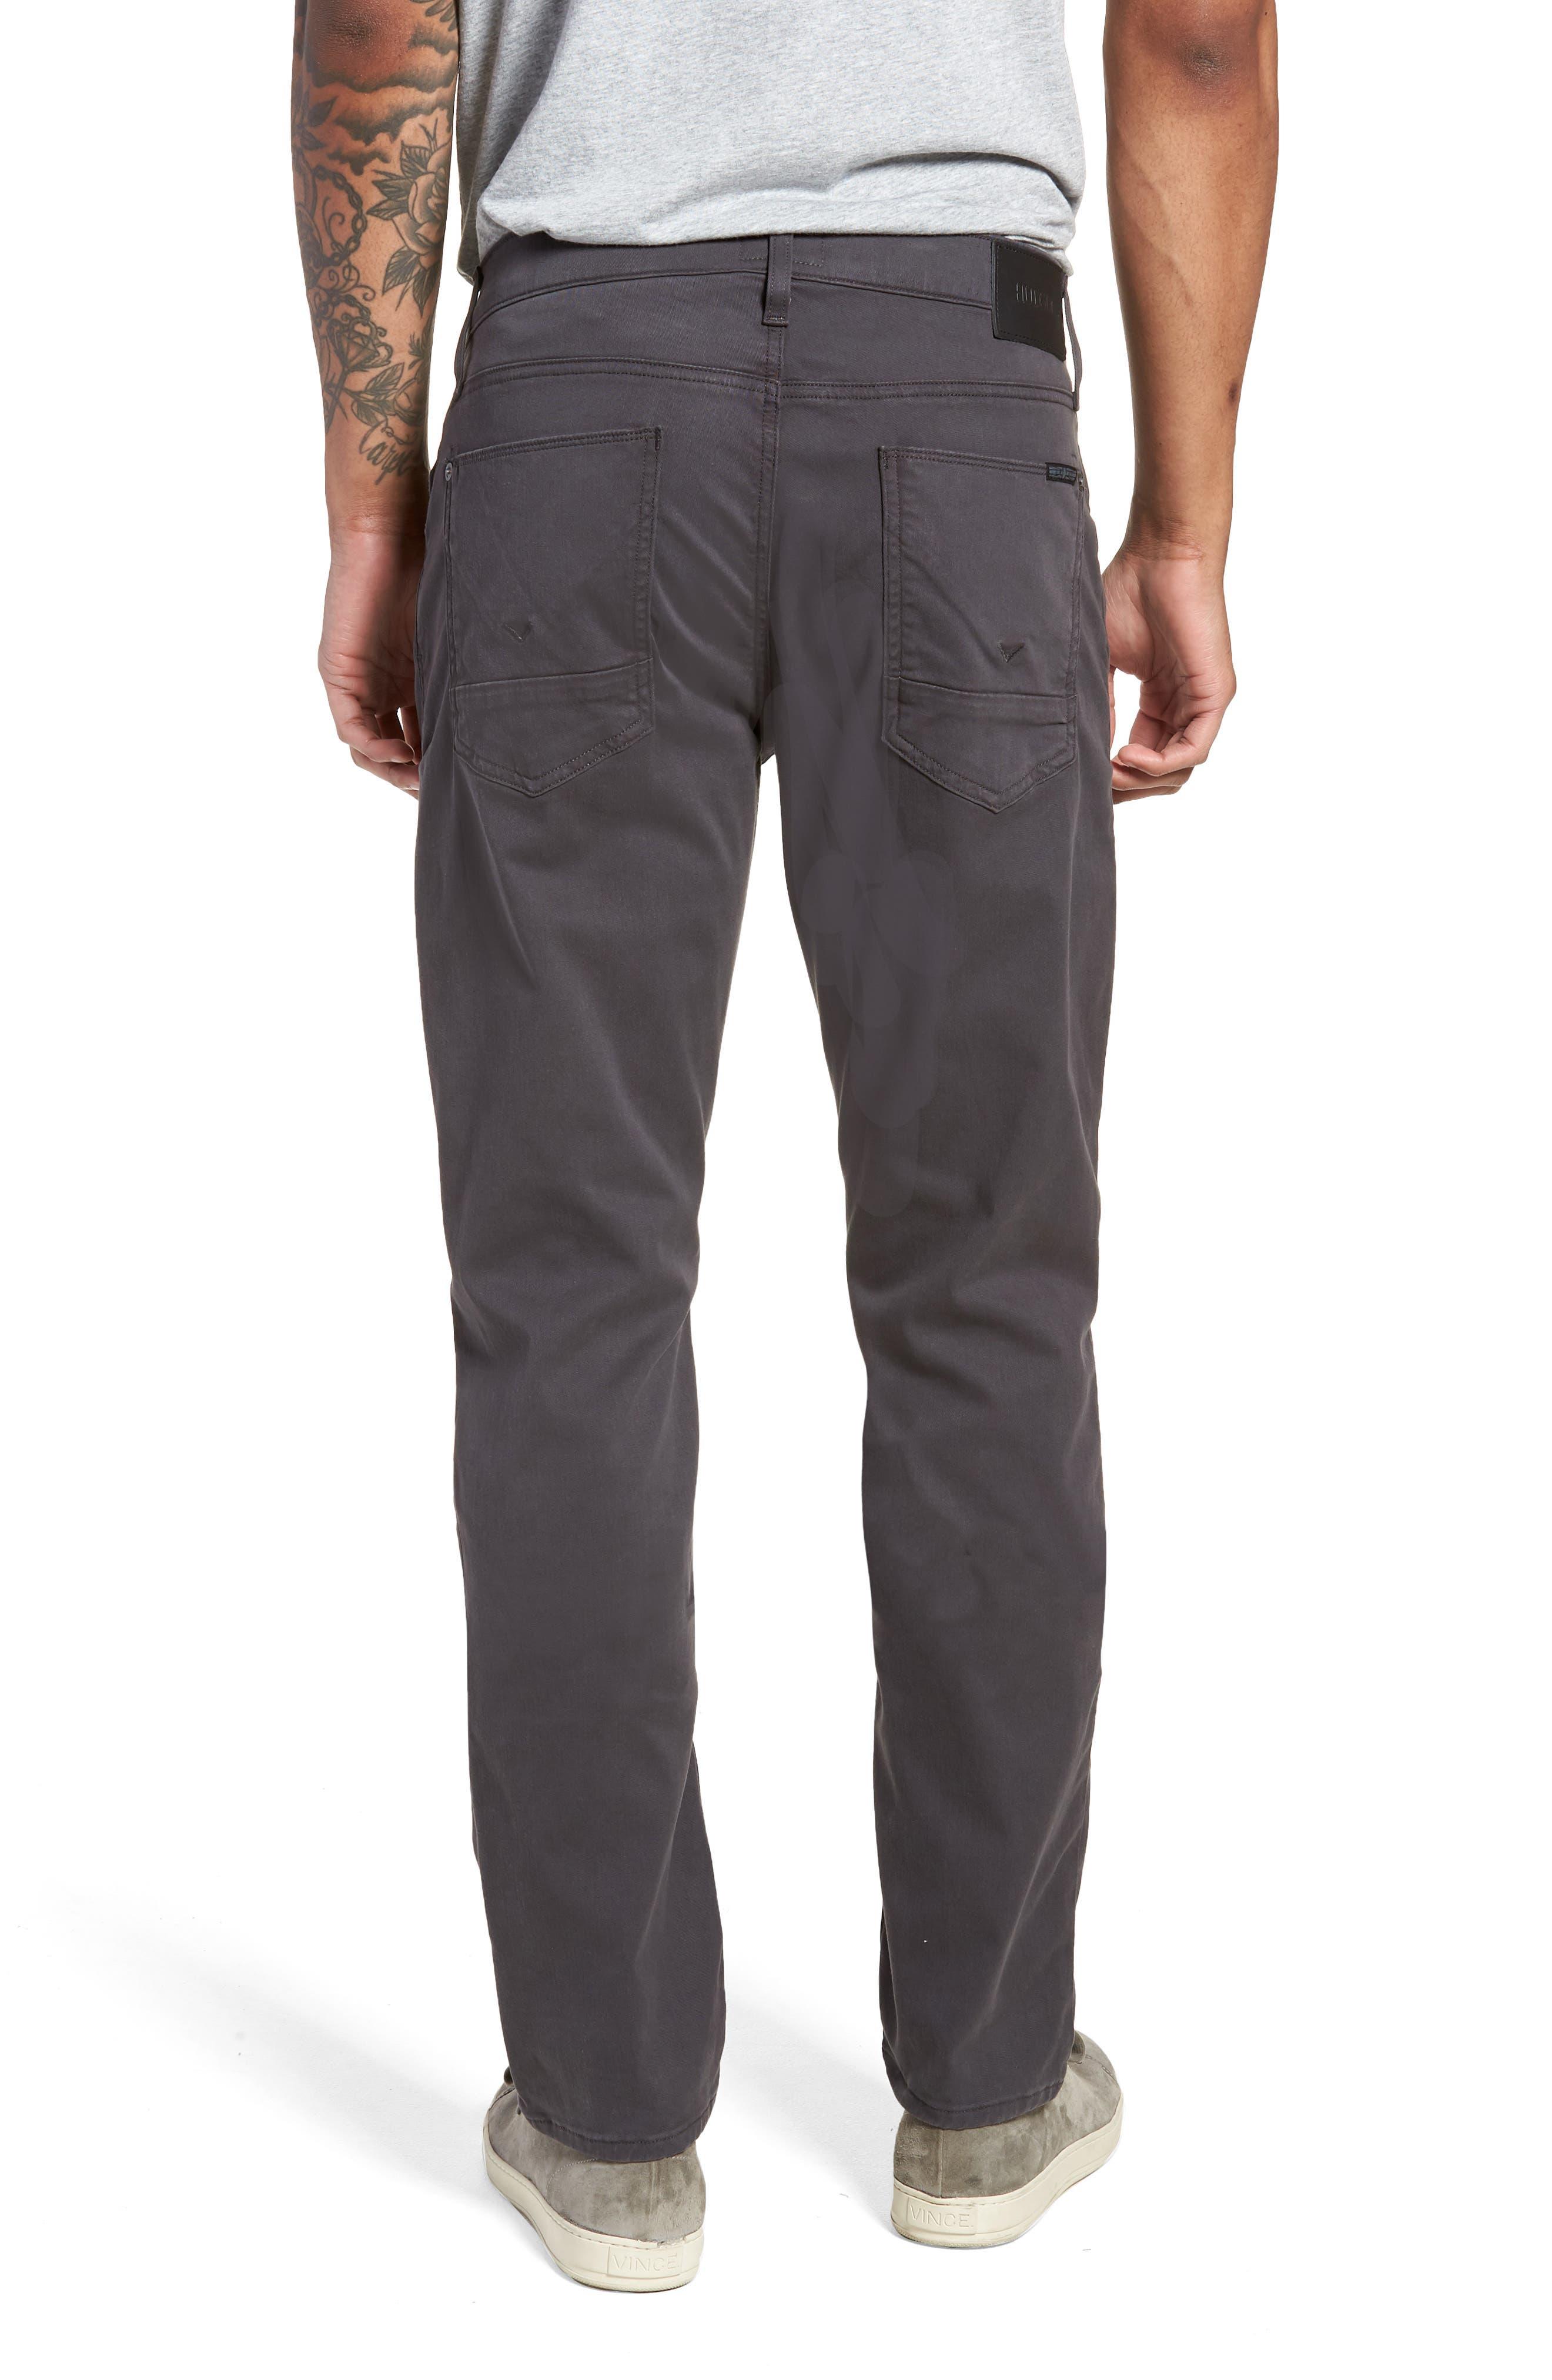 Blake Slim Fit Jeans,                             Alternate thumbnail 2, color,                             Metal